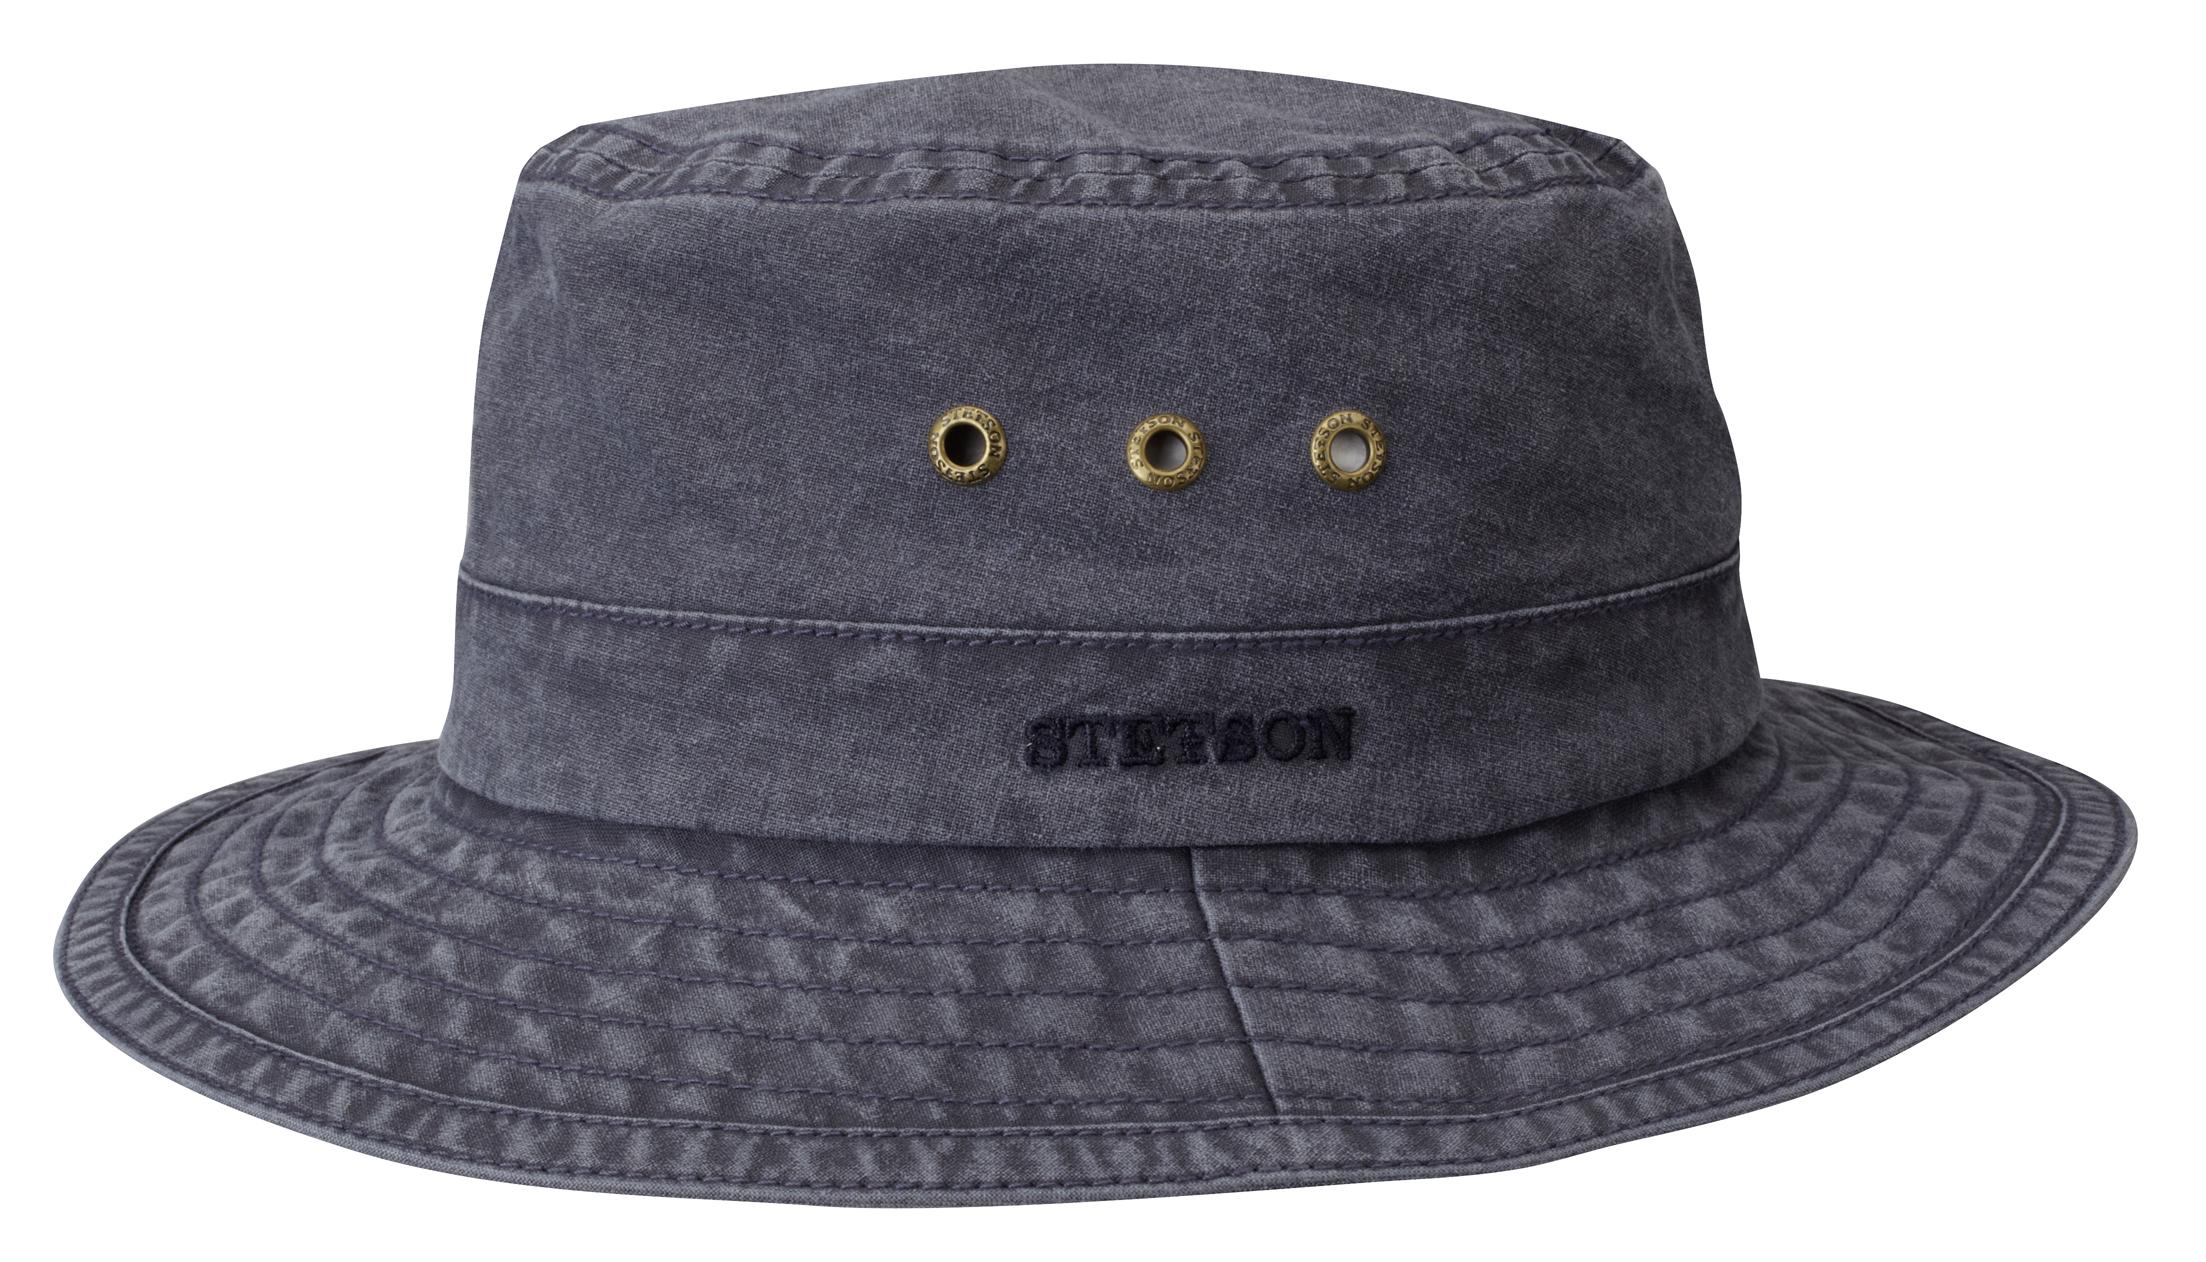 Stetson - Stetson Trilby Ramie Vintage Navy Hat